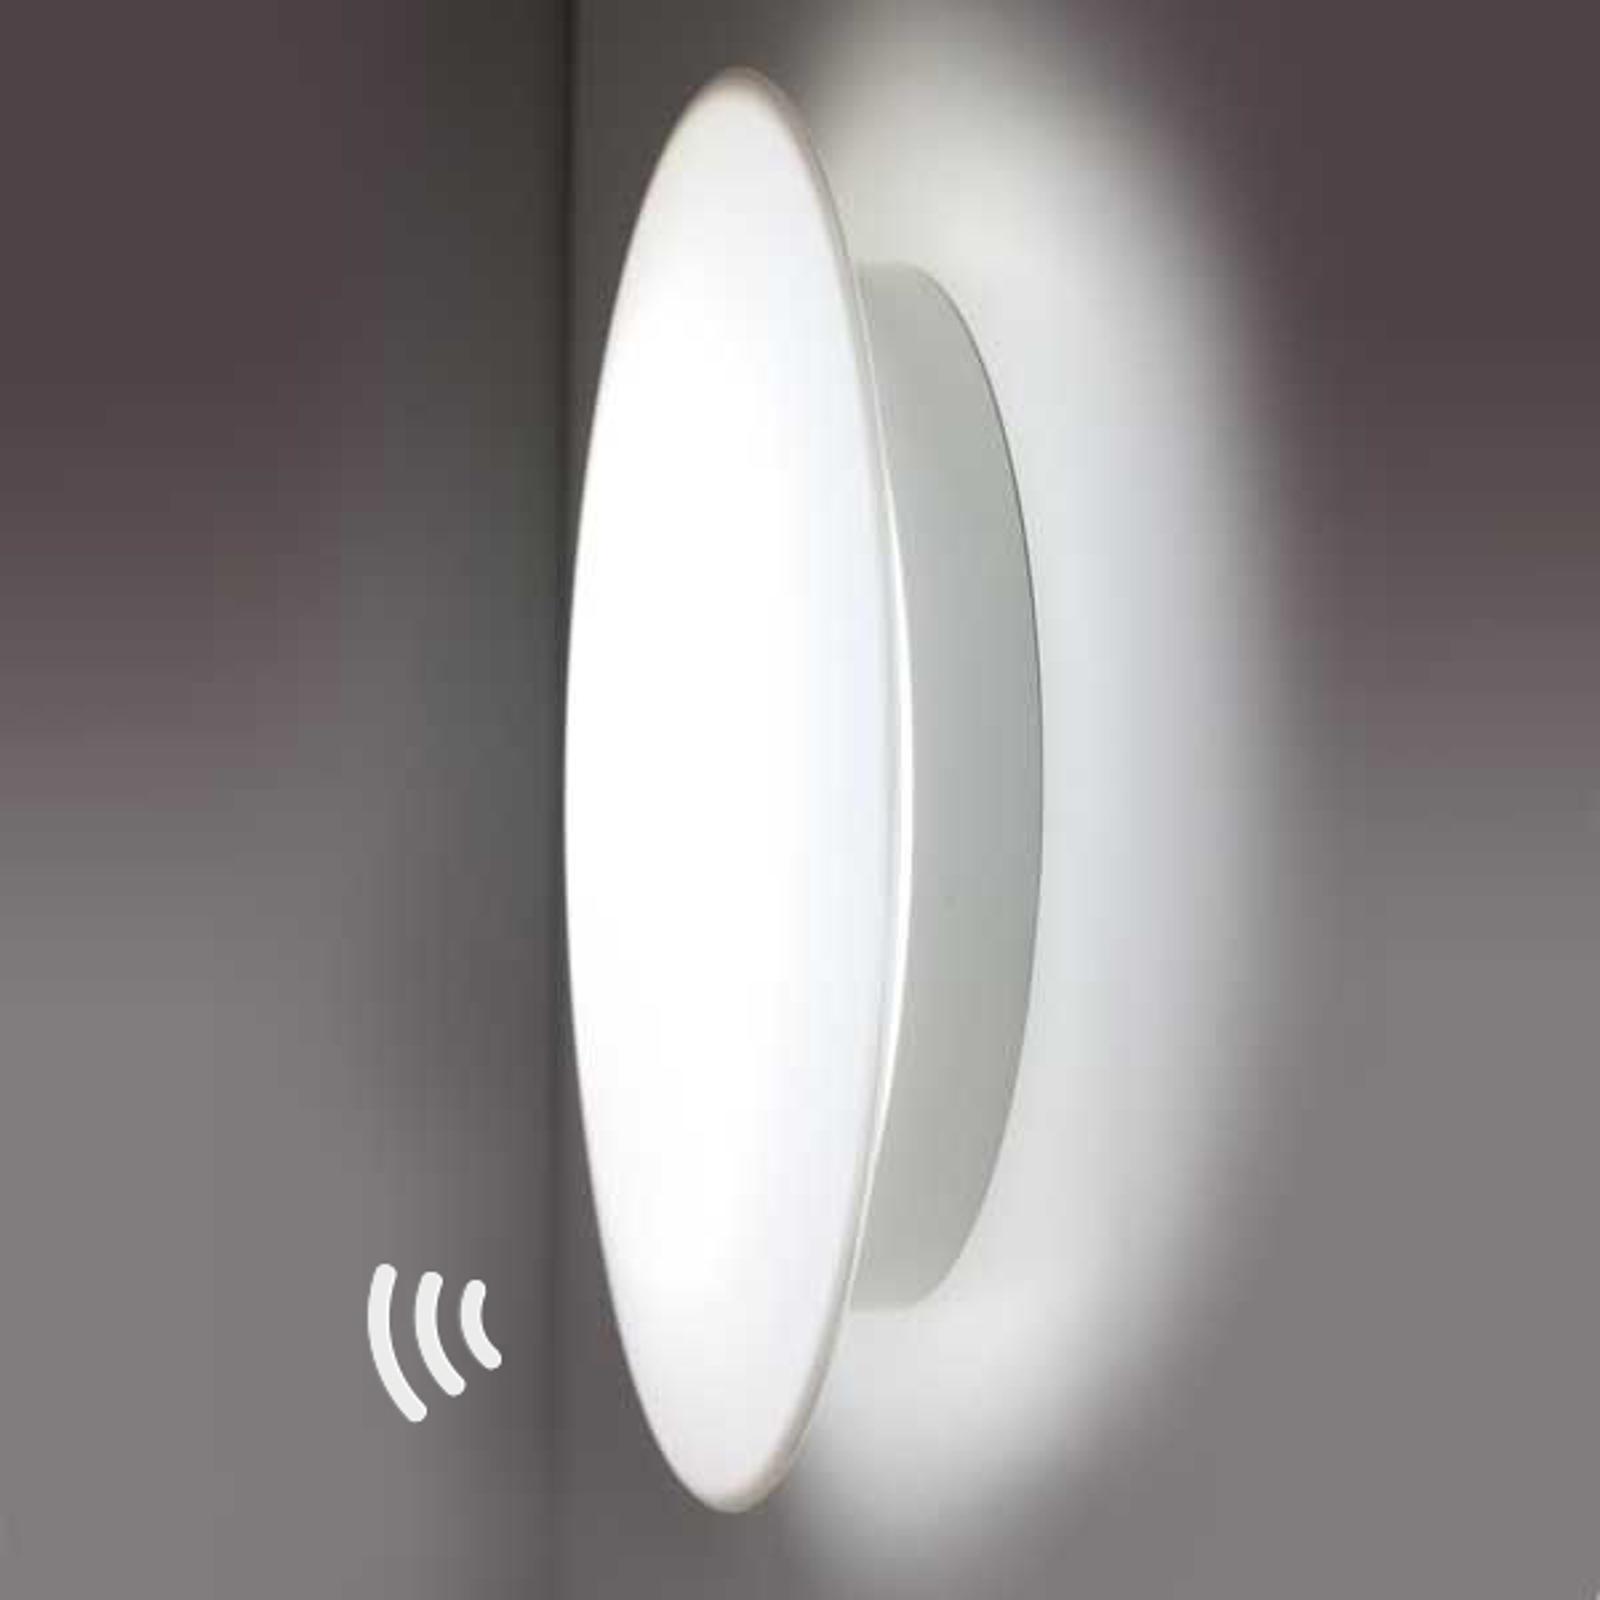 Nástenné LED Sun 3 4000 K 13 W LED, senzor_1018249_1